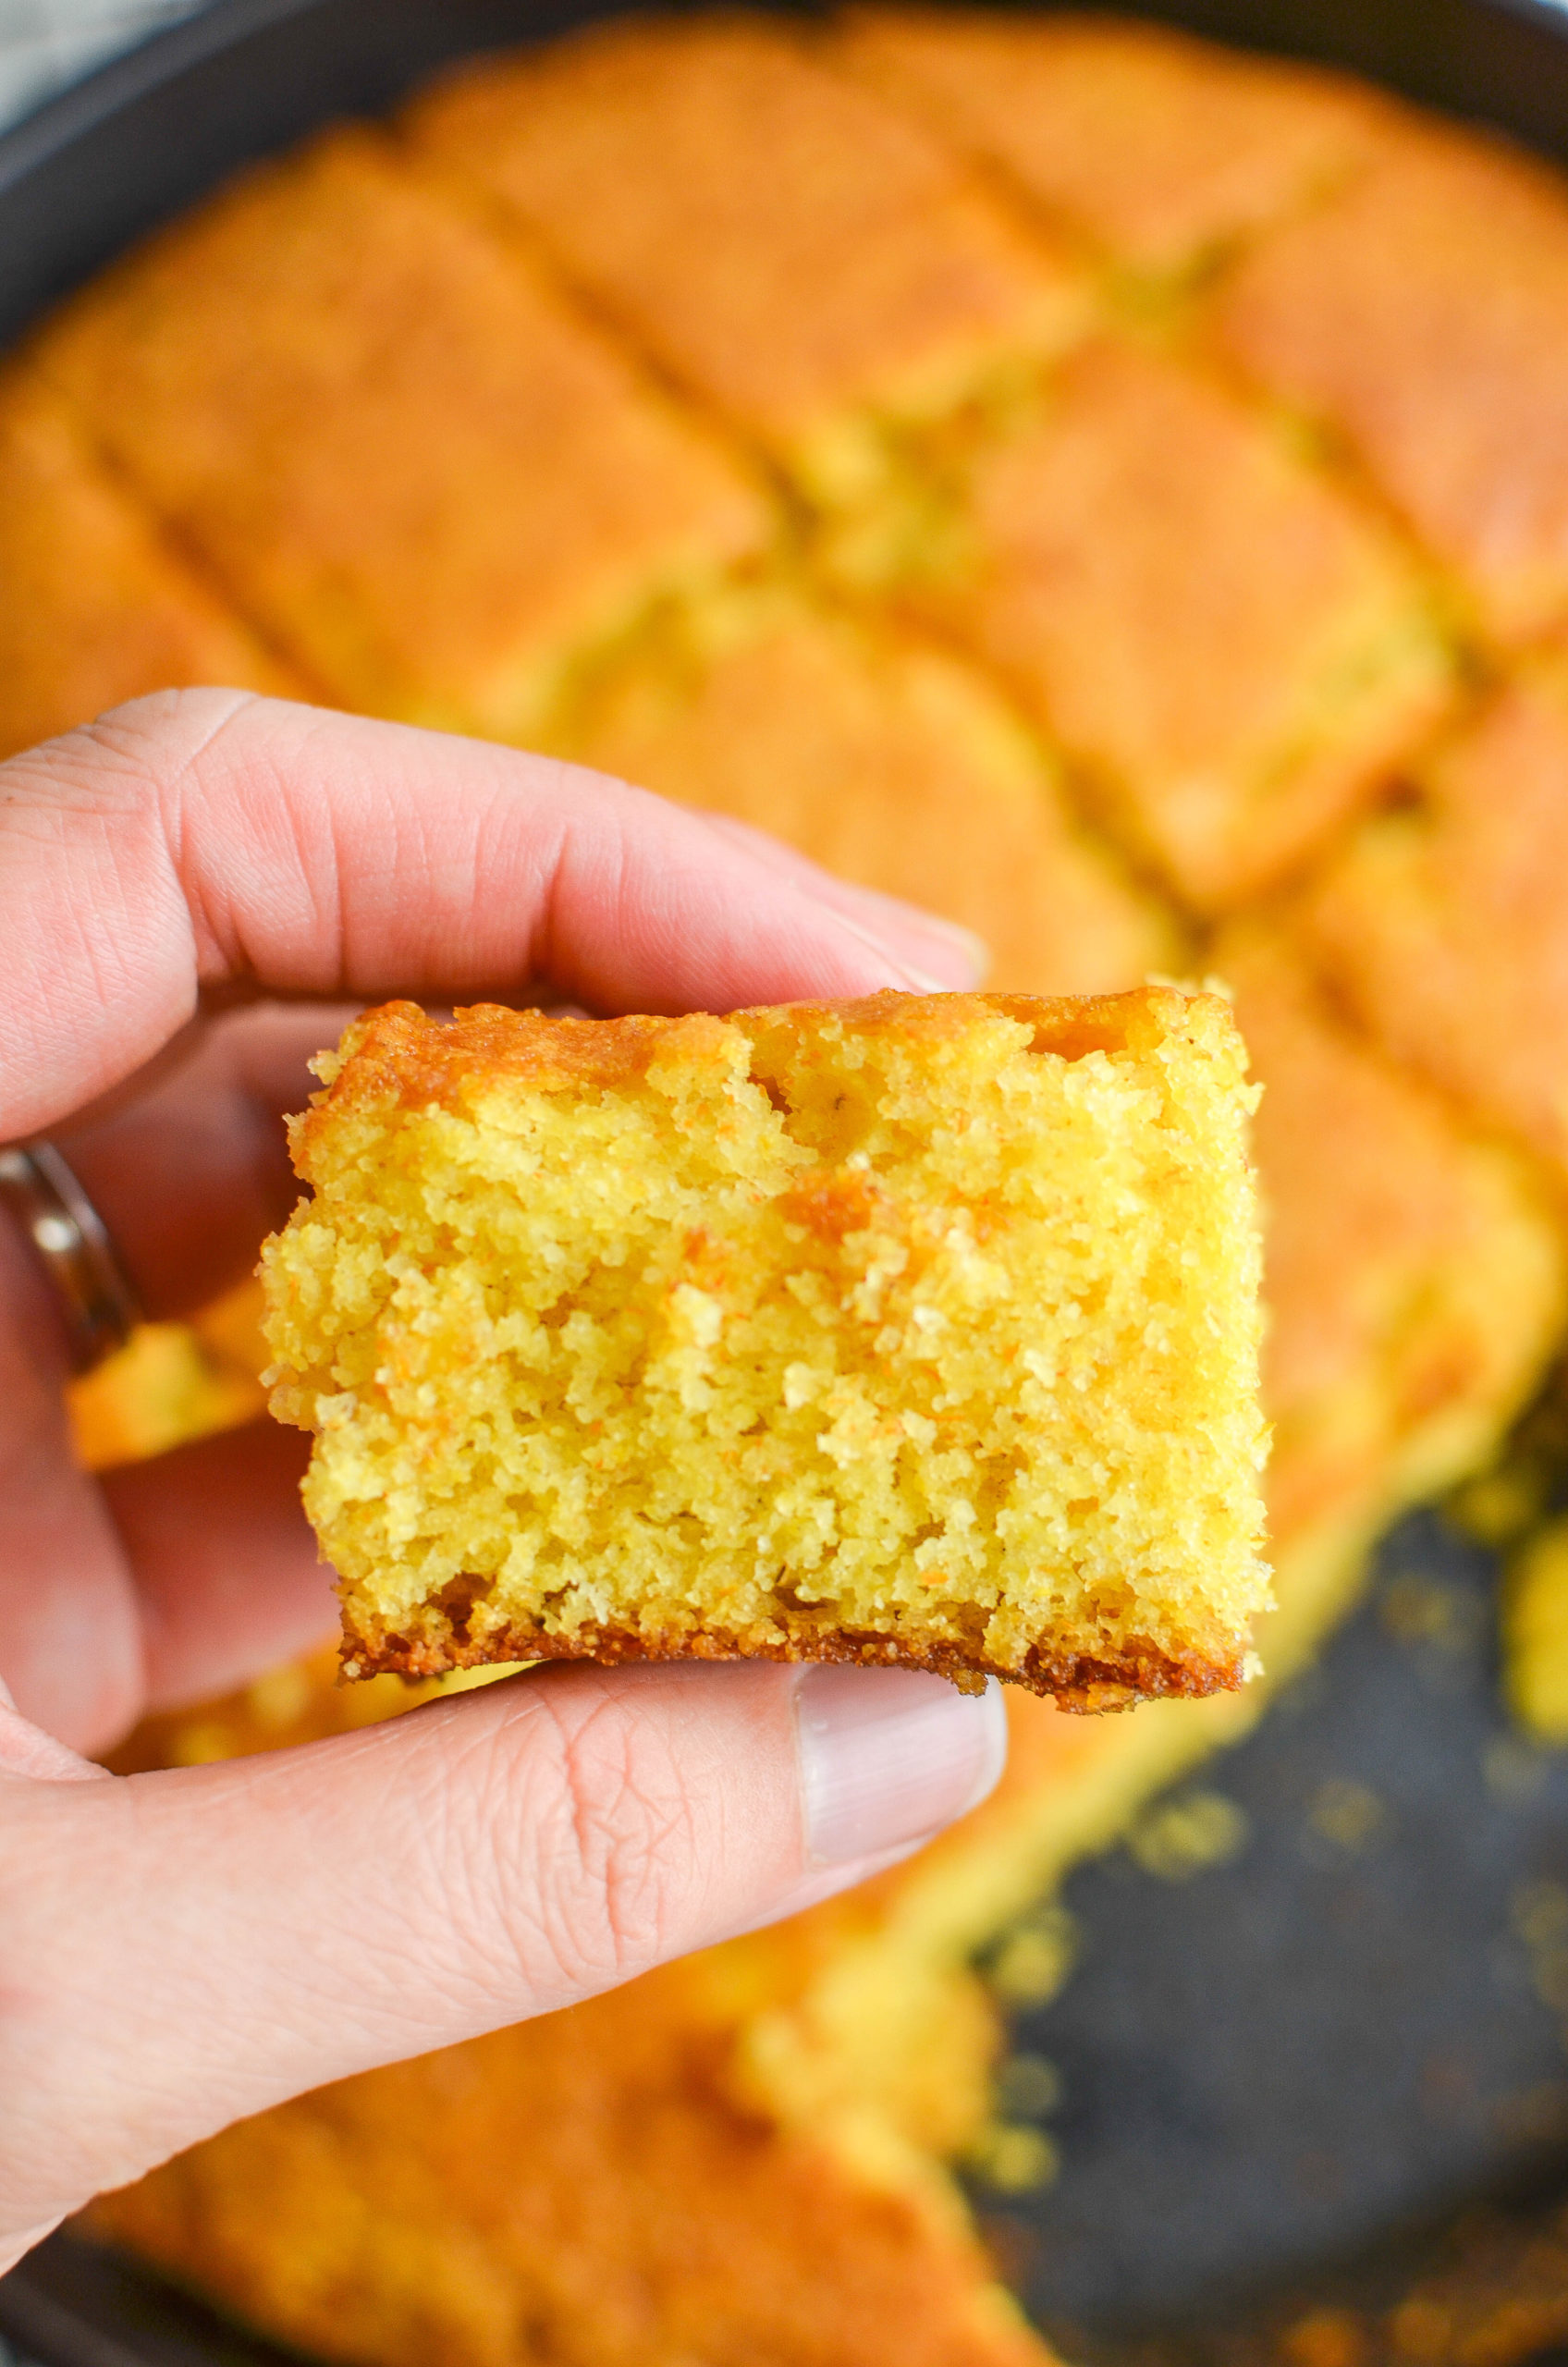 Hand holding a square of cornbread.